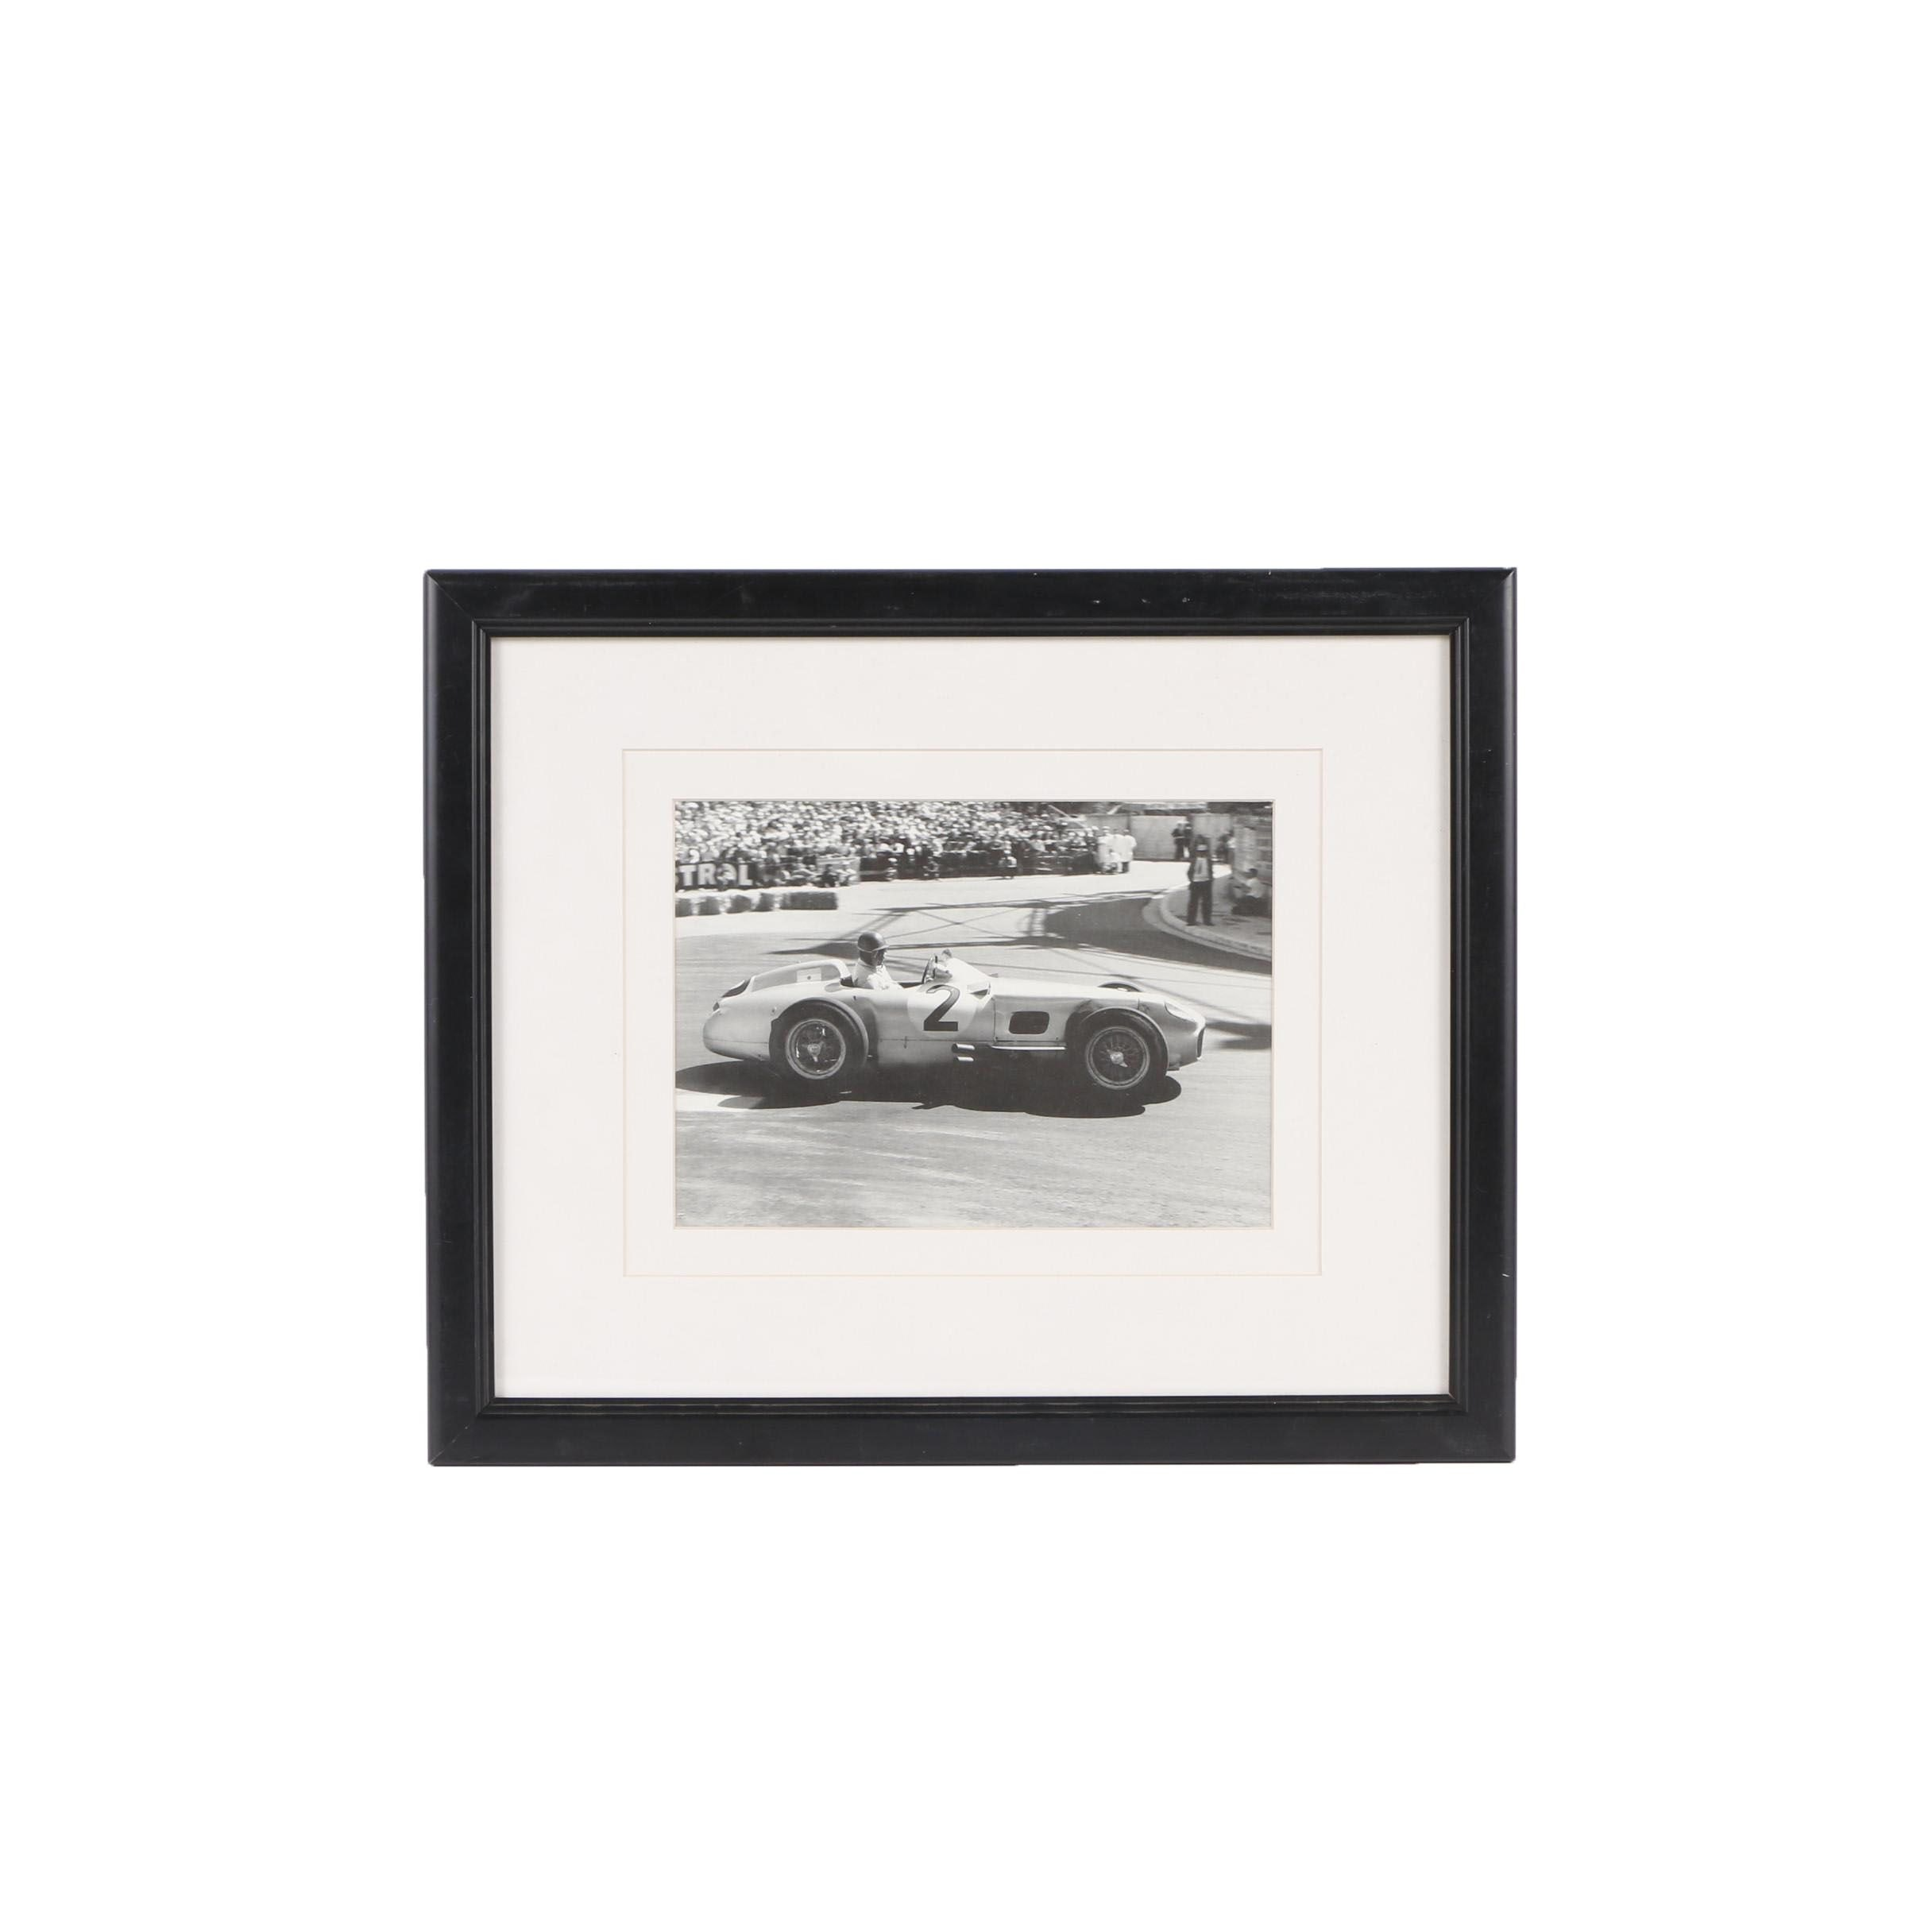 "Halftone Print After Alan Smith ""Grand Prix De Monaco 1955 """